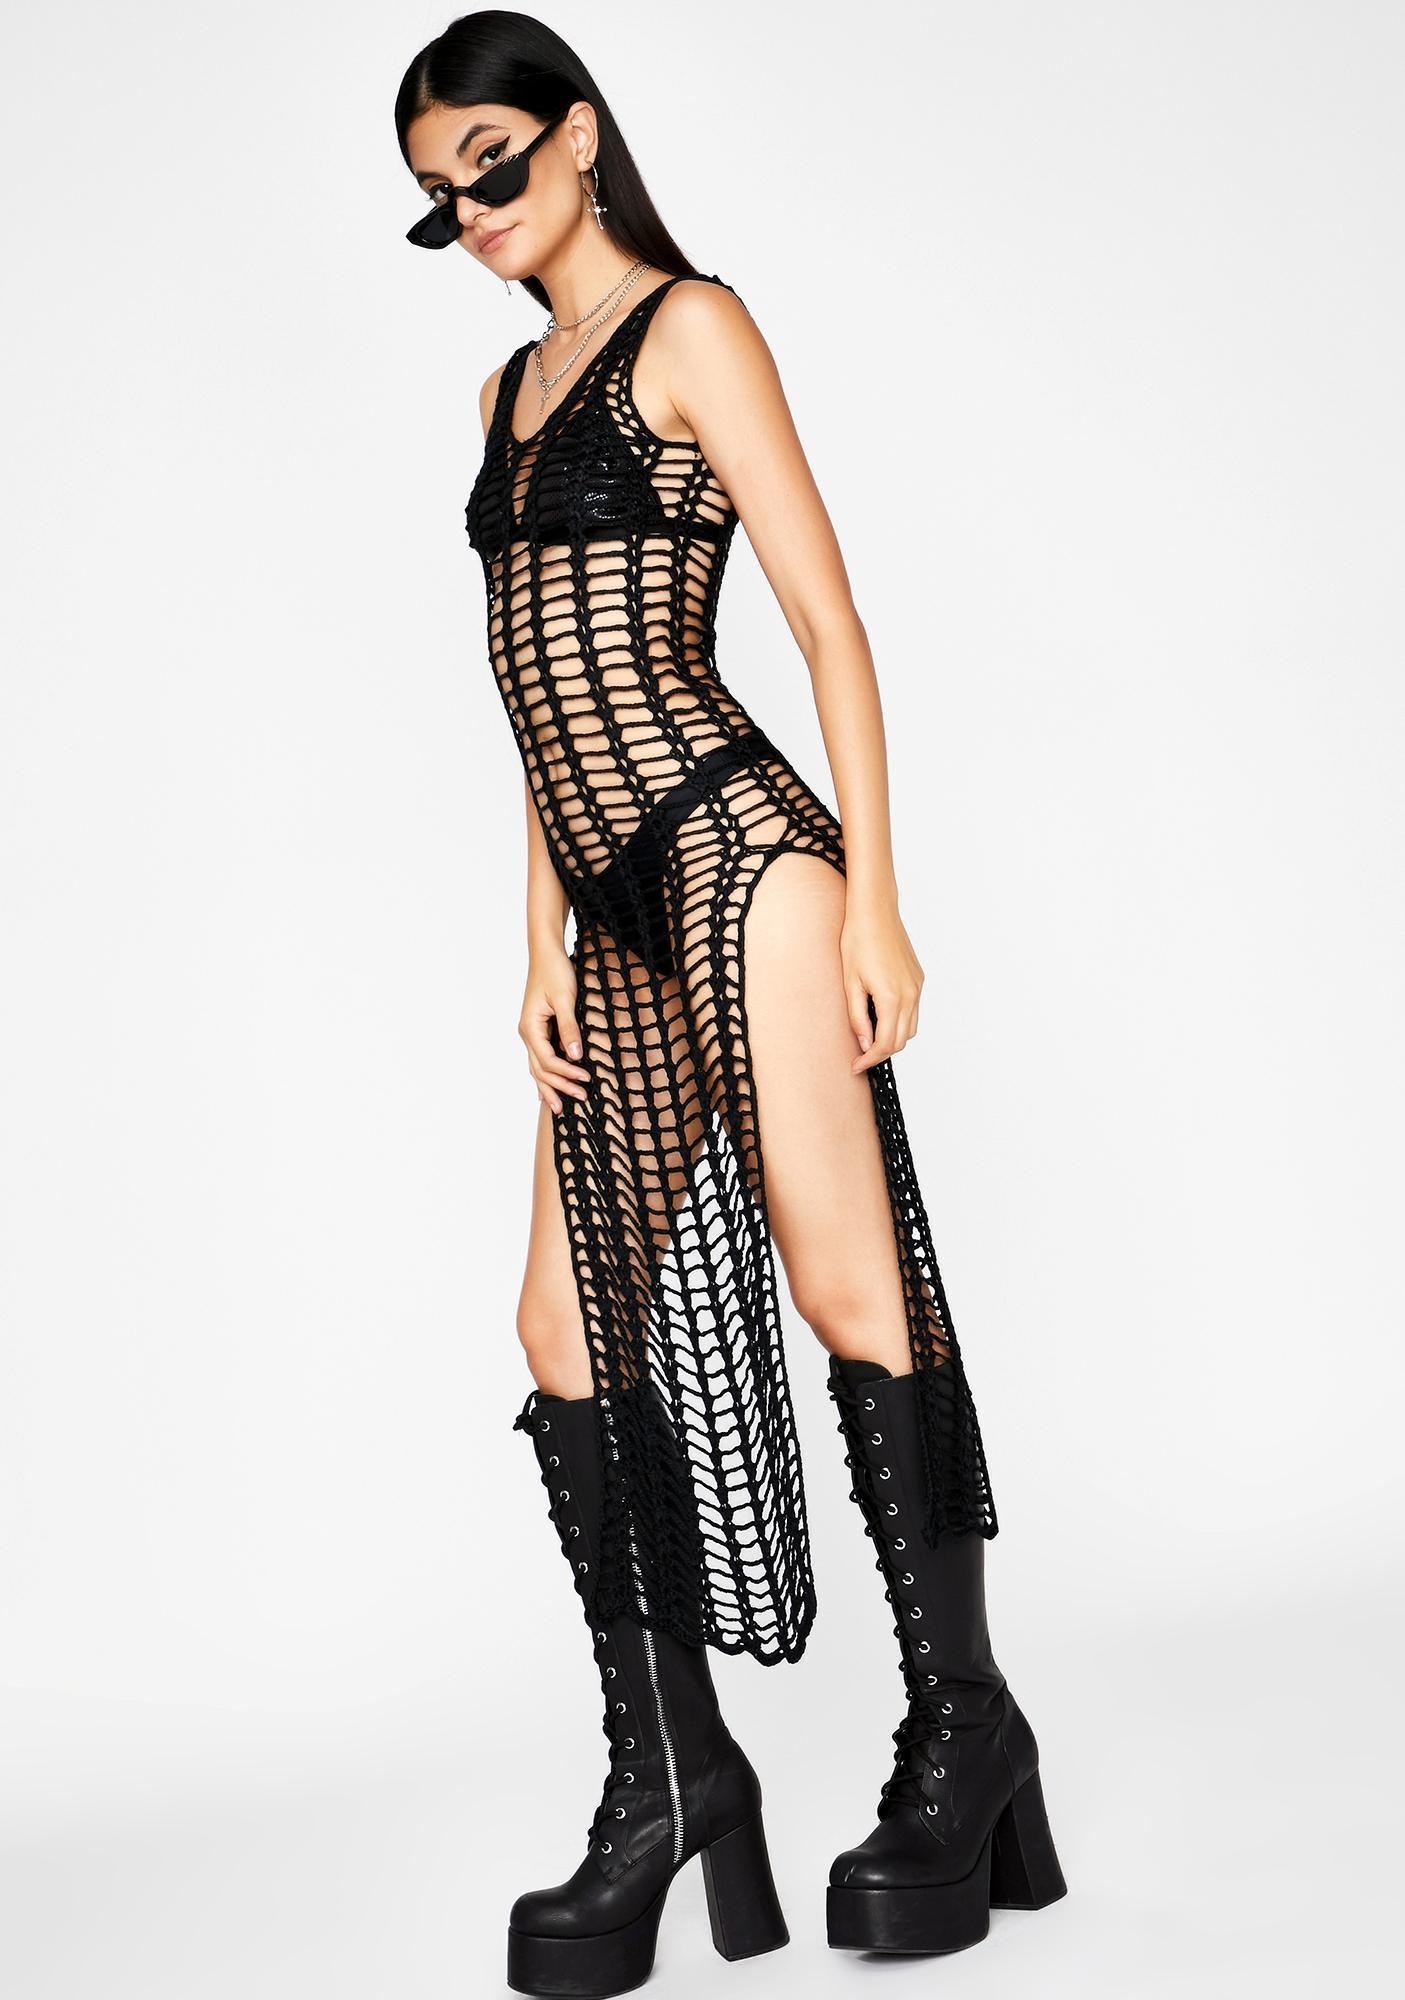 Don't Stare Fishnet Dress